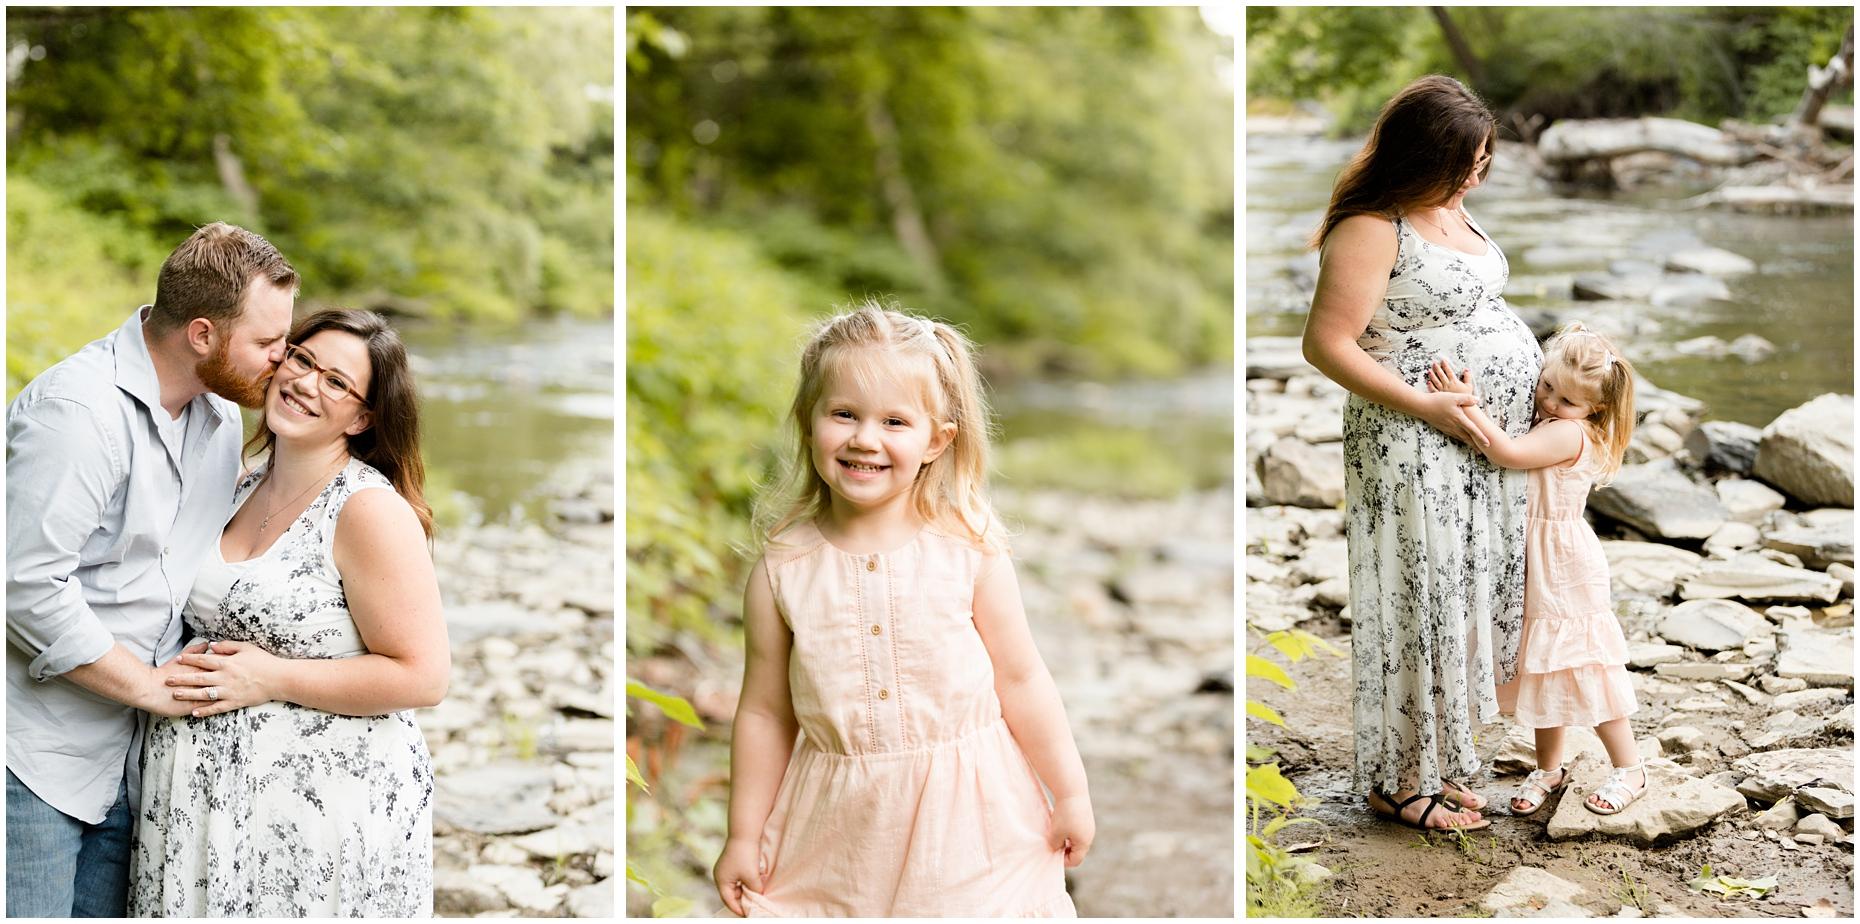 Pennell_Maternity_Family_Hamburg_18_Mile_Creek_Photography_Buffalo_New_York